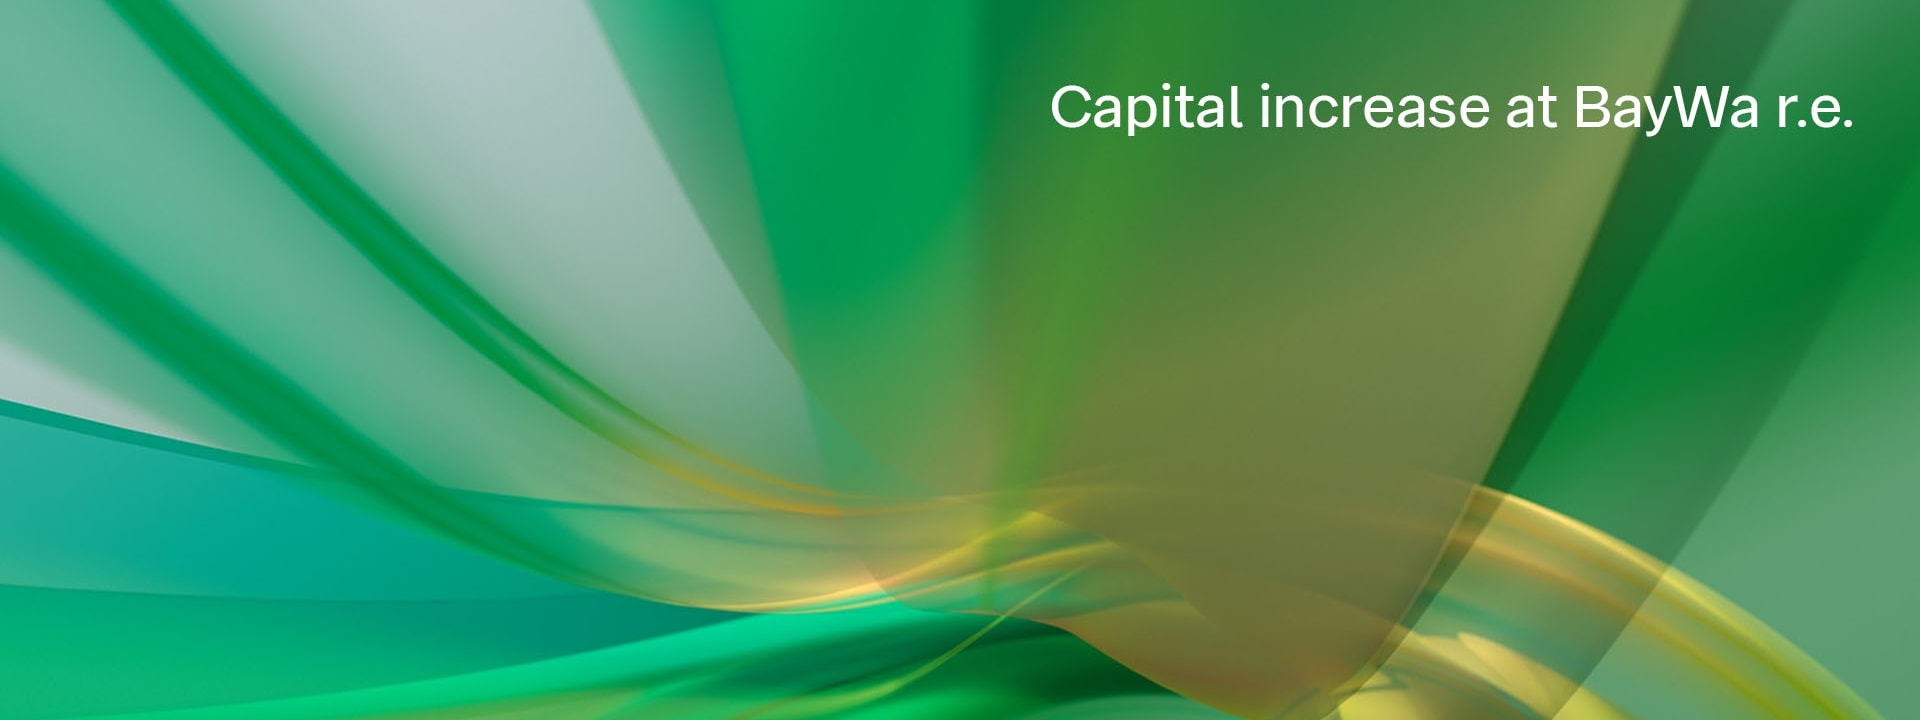 Graphic capital increase BayWa r.e.